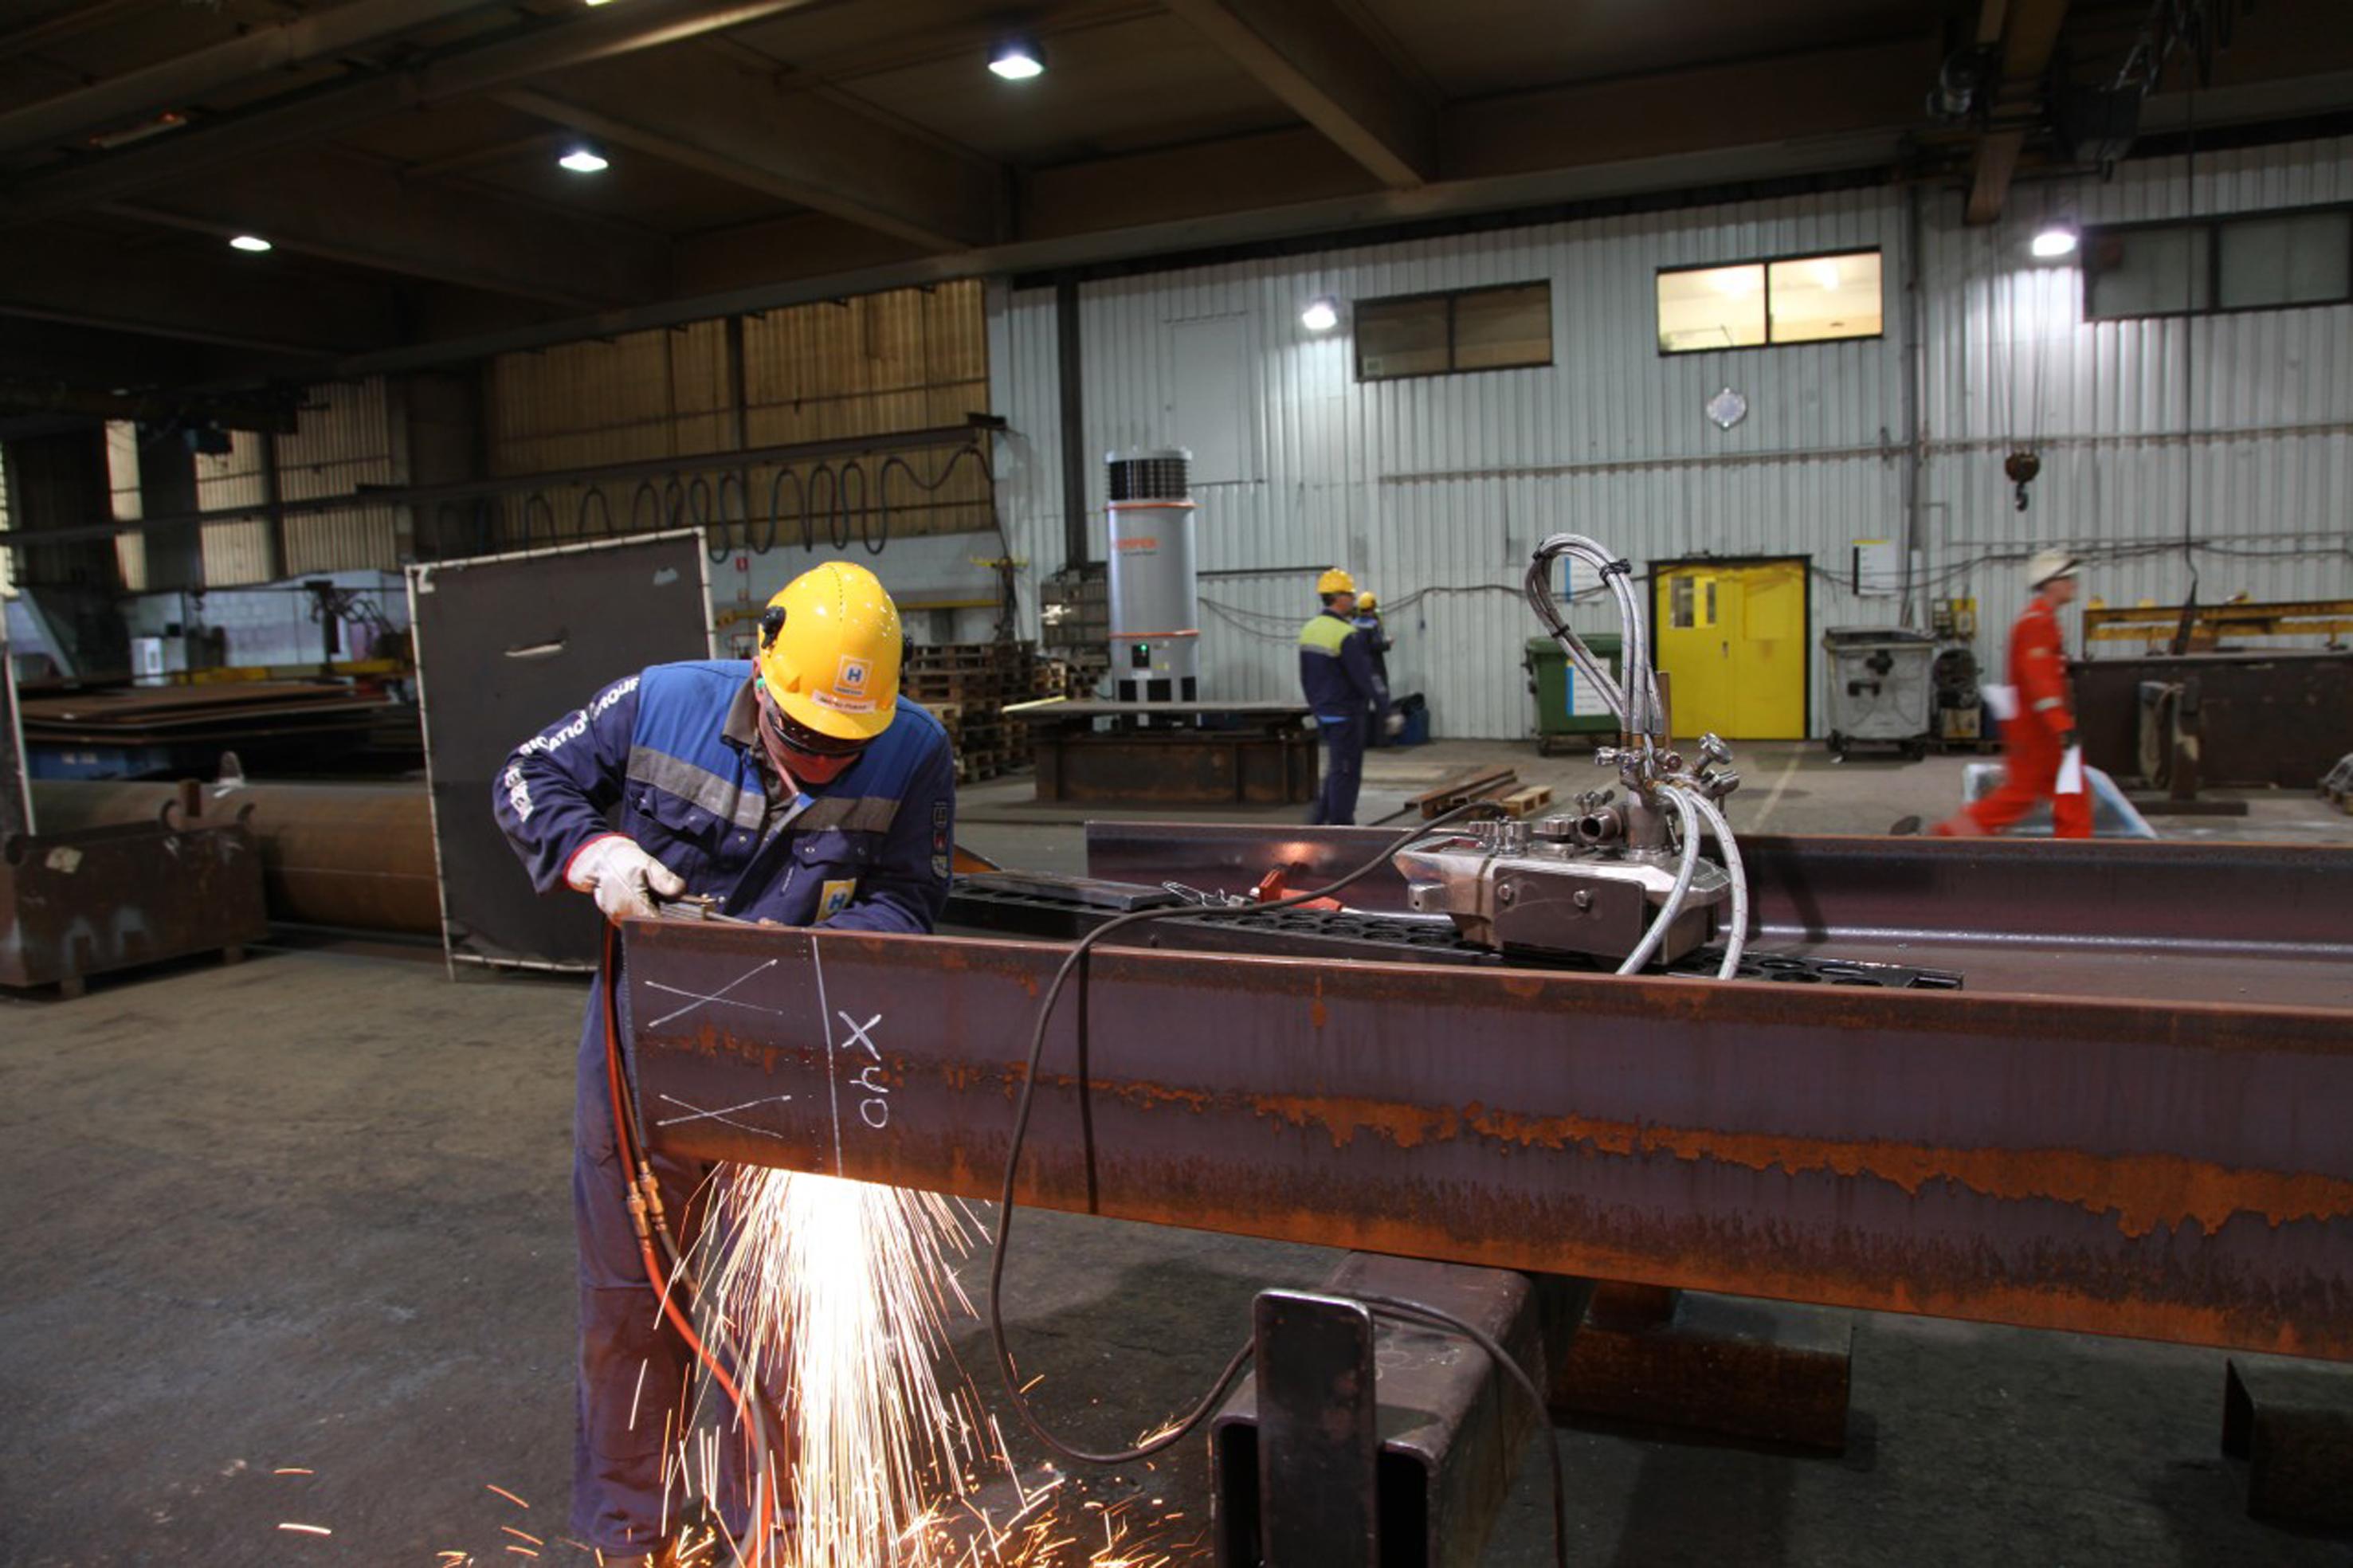 Heerema employs innovative displacement ventilation